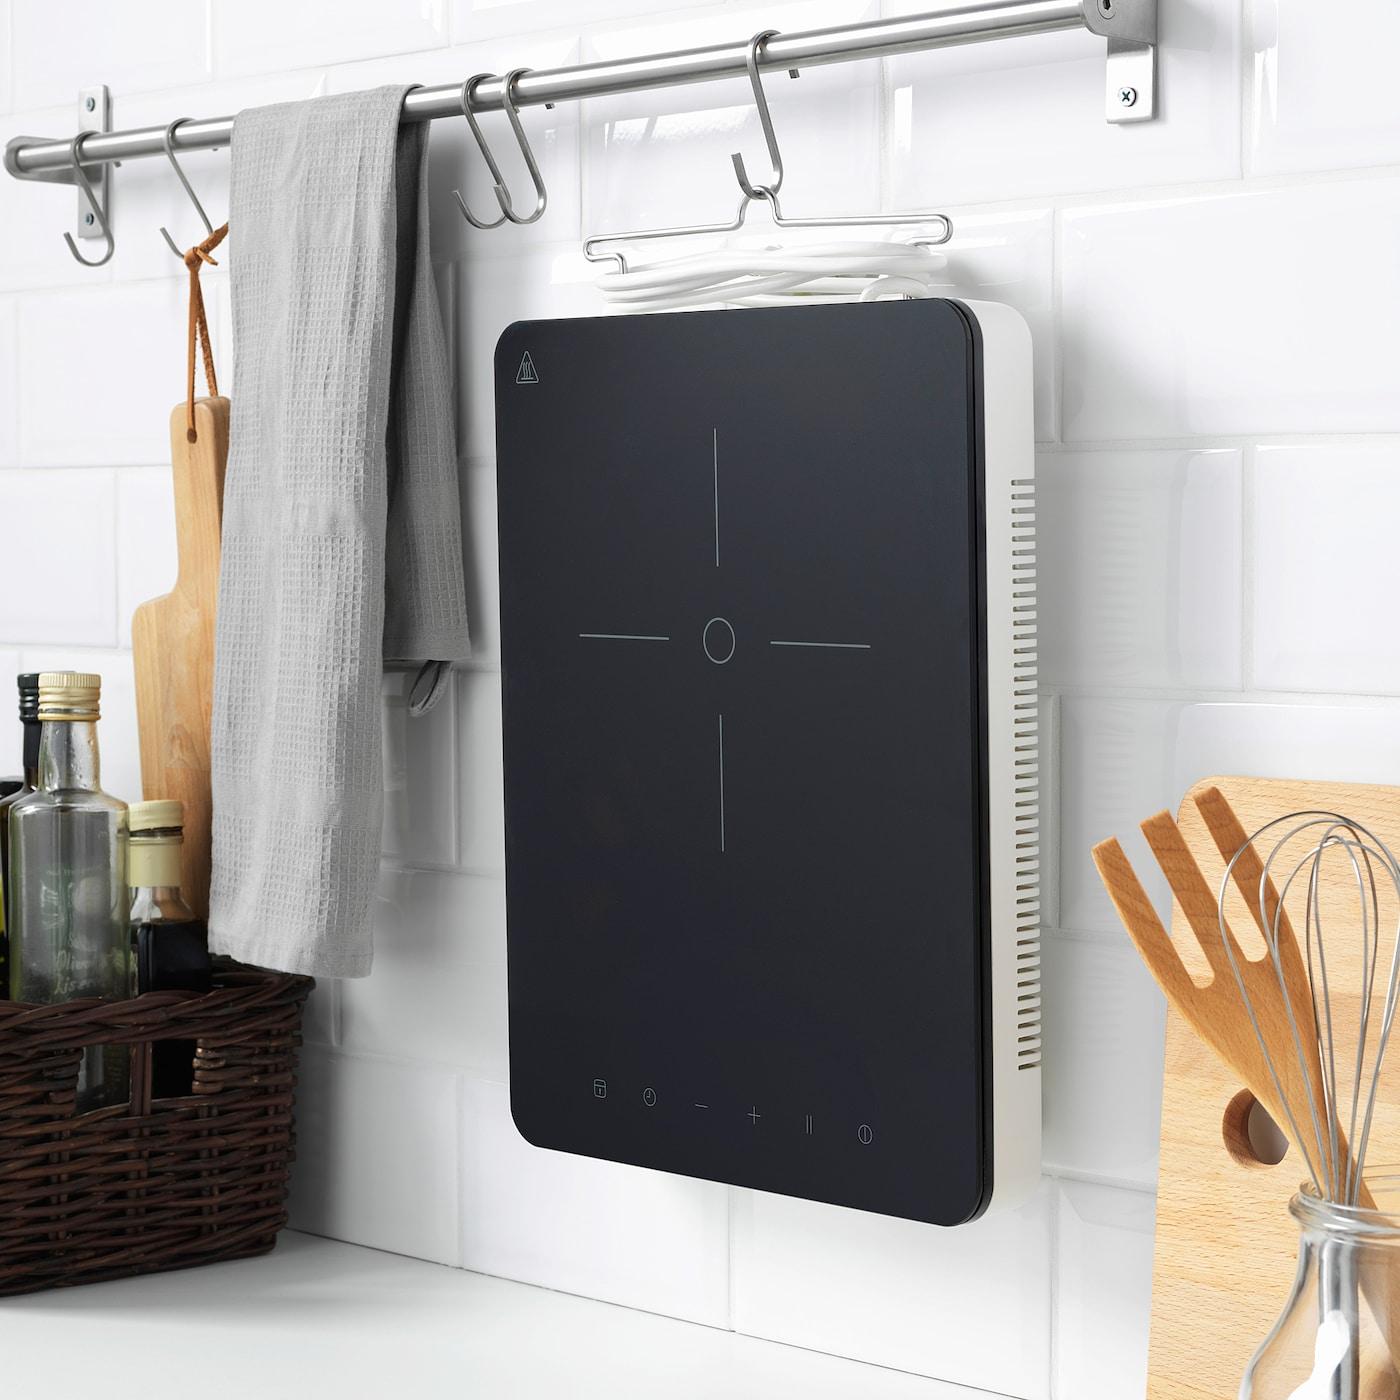 Portable induction hob IKEA